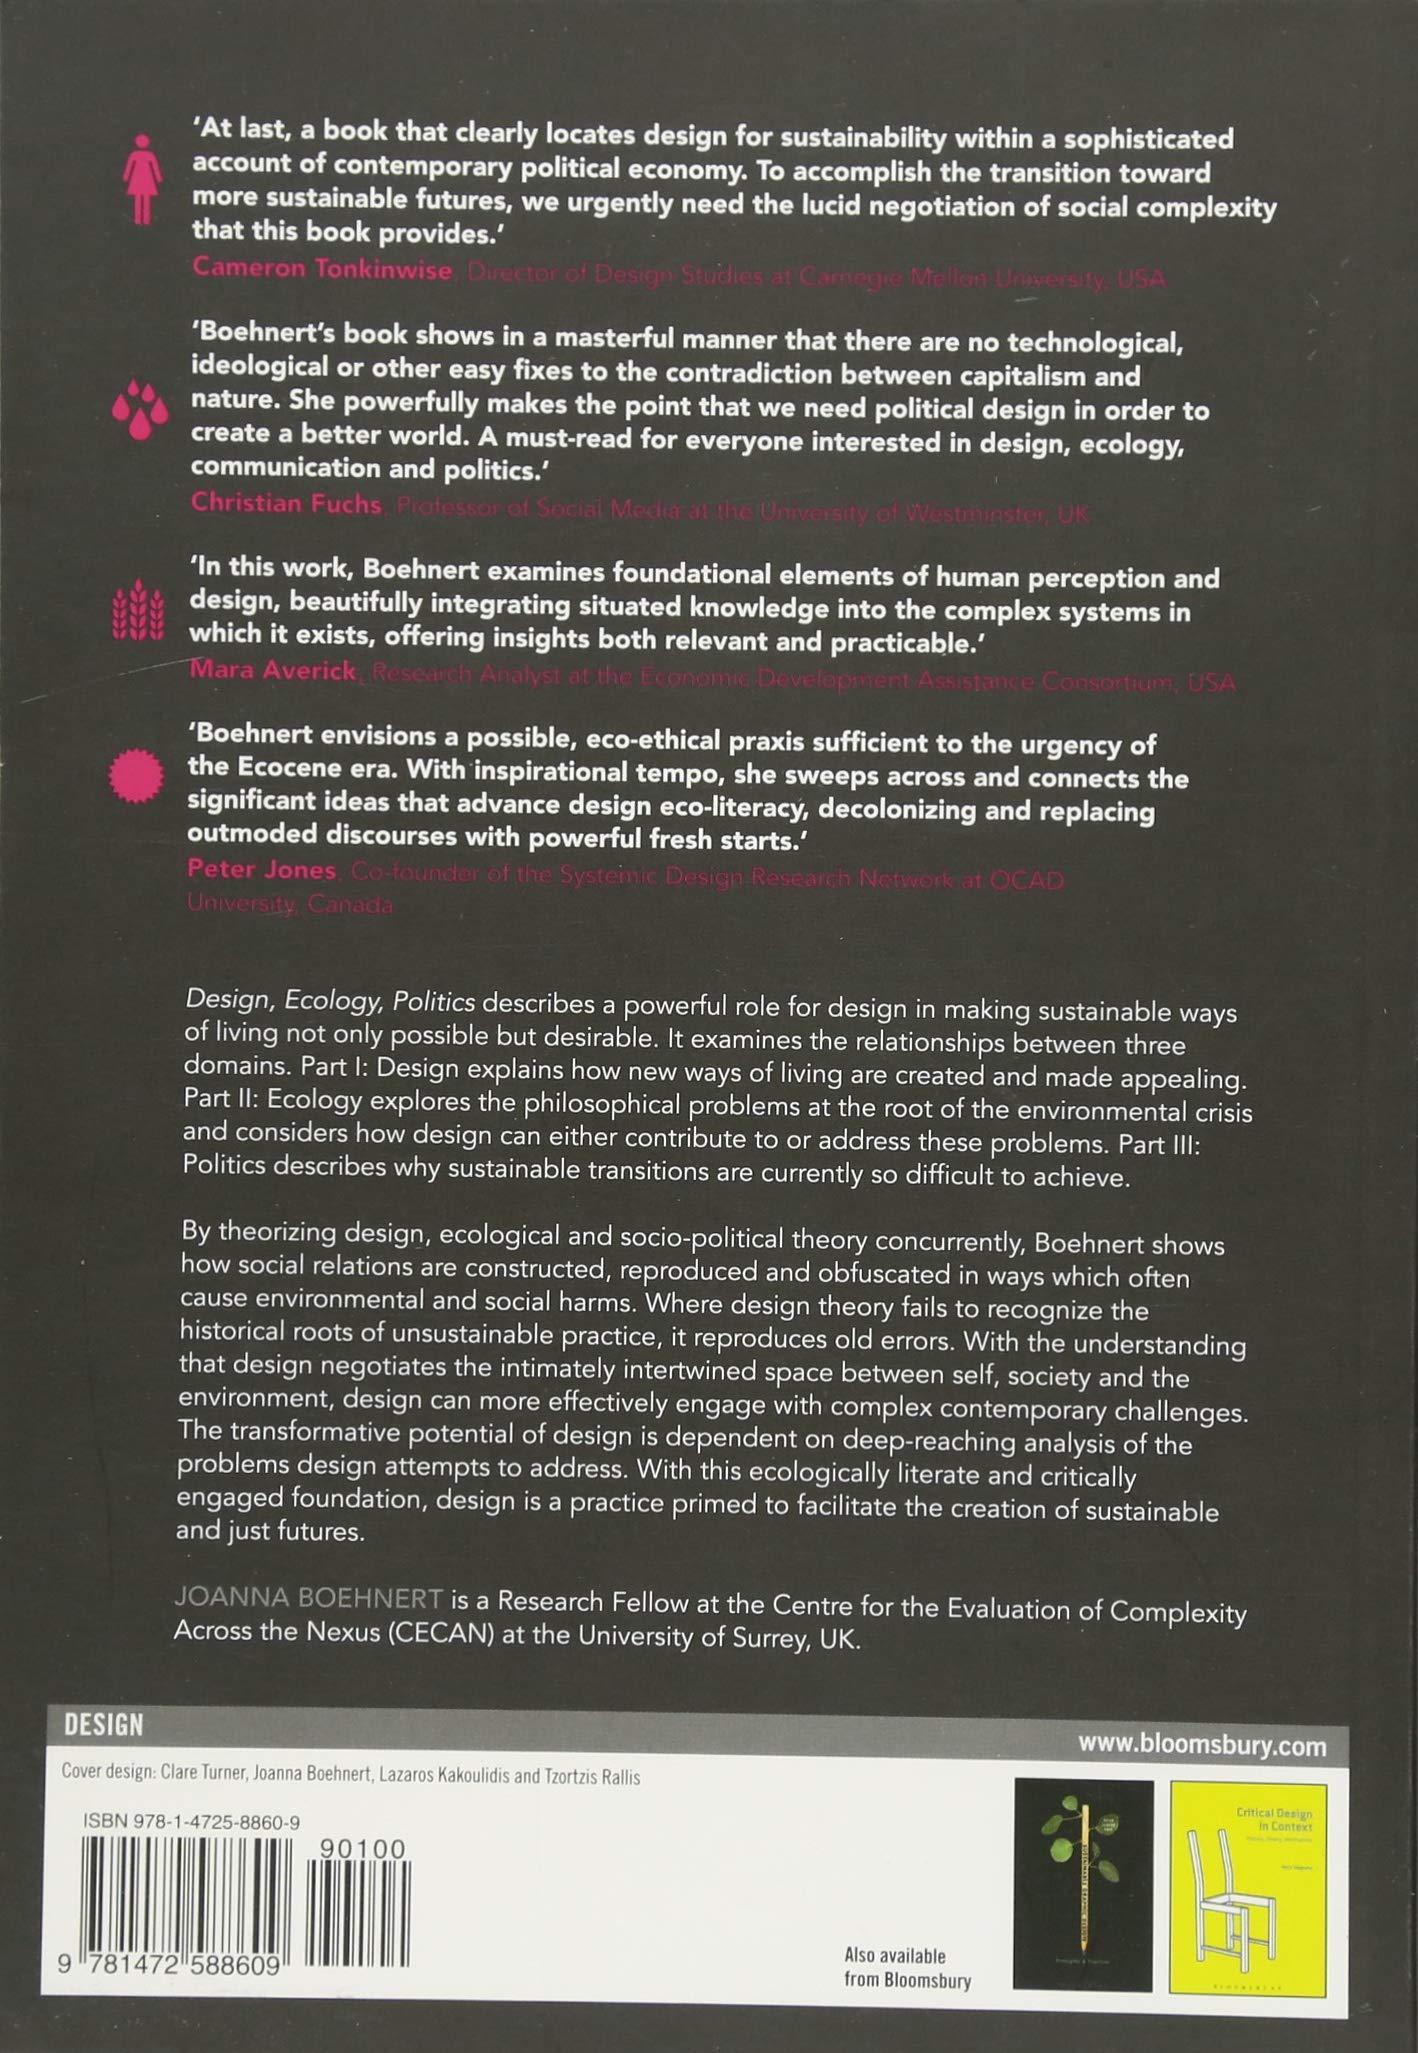 Design, Ecology, Politics: Amazon co uk: Joanna Boehnert: Books